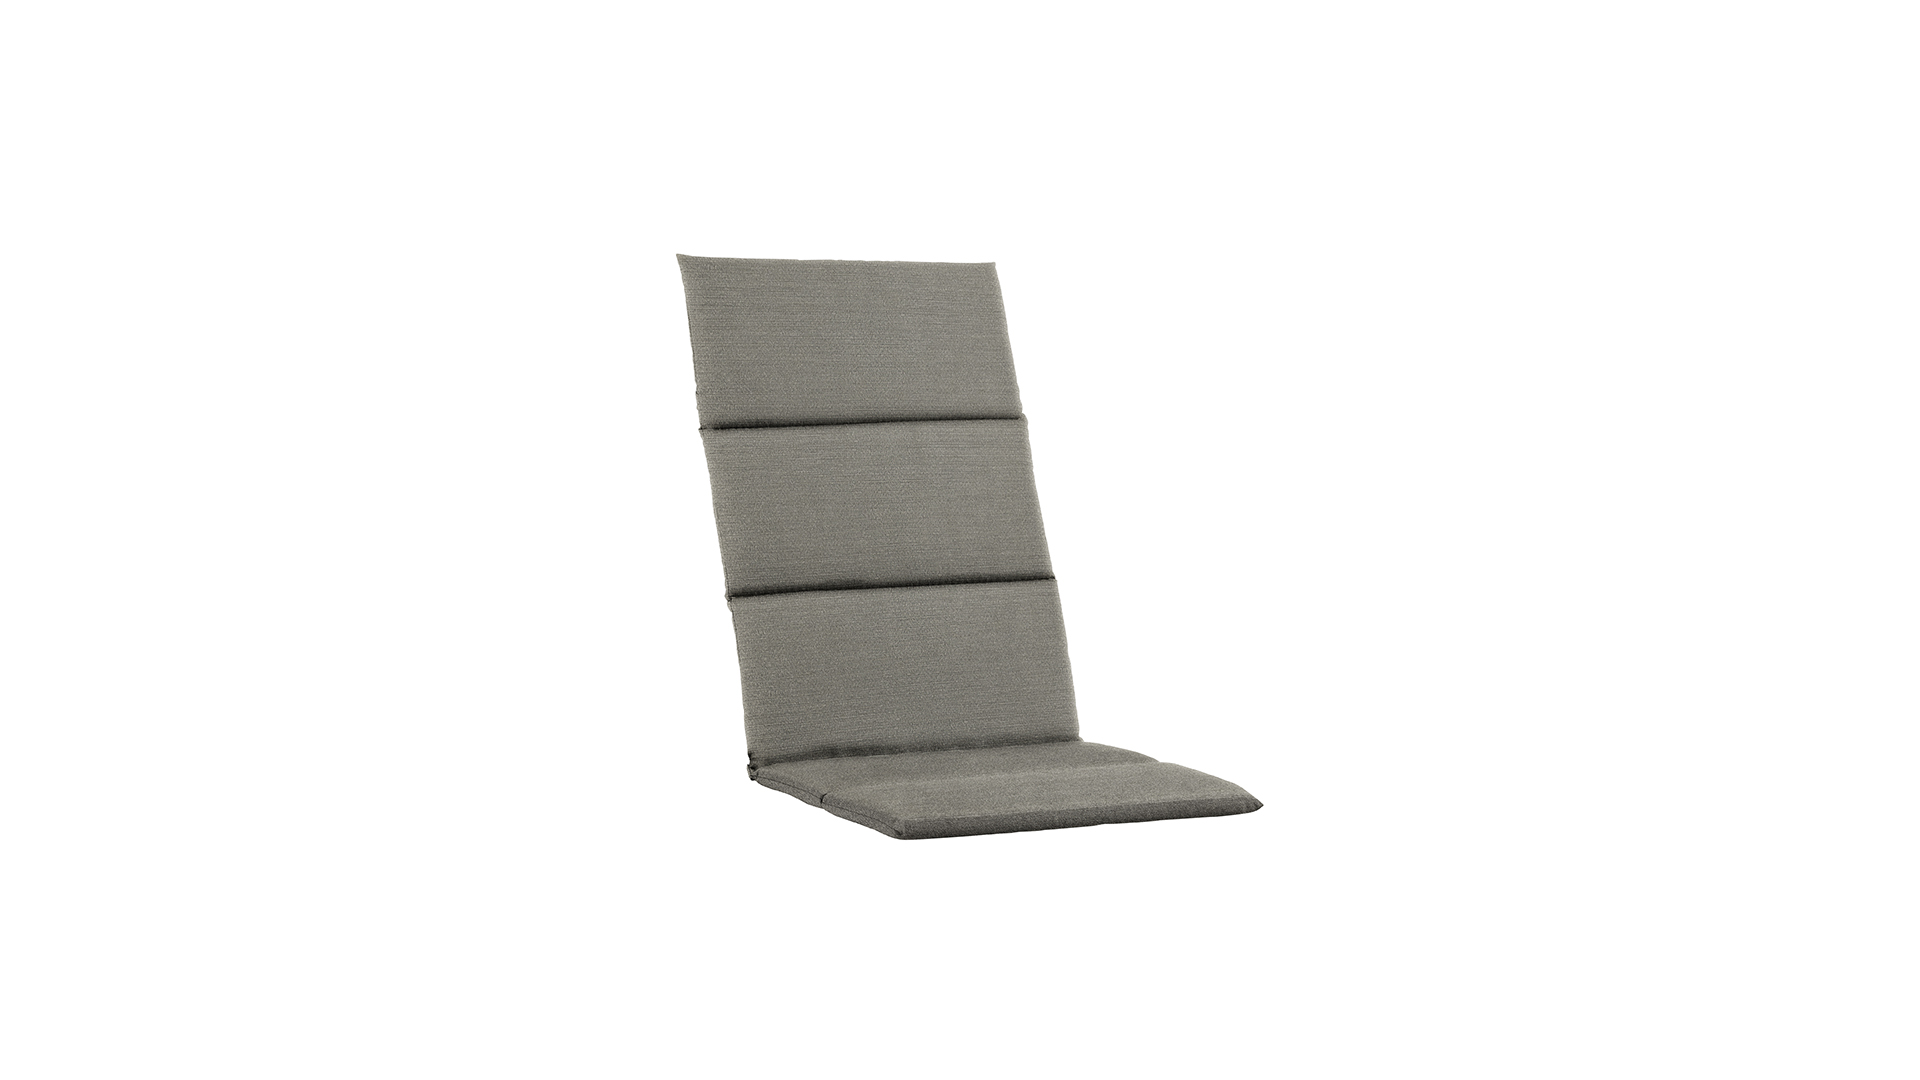 SEE Sesselauflage 120 x 48 x 3 cm